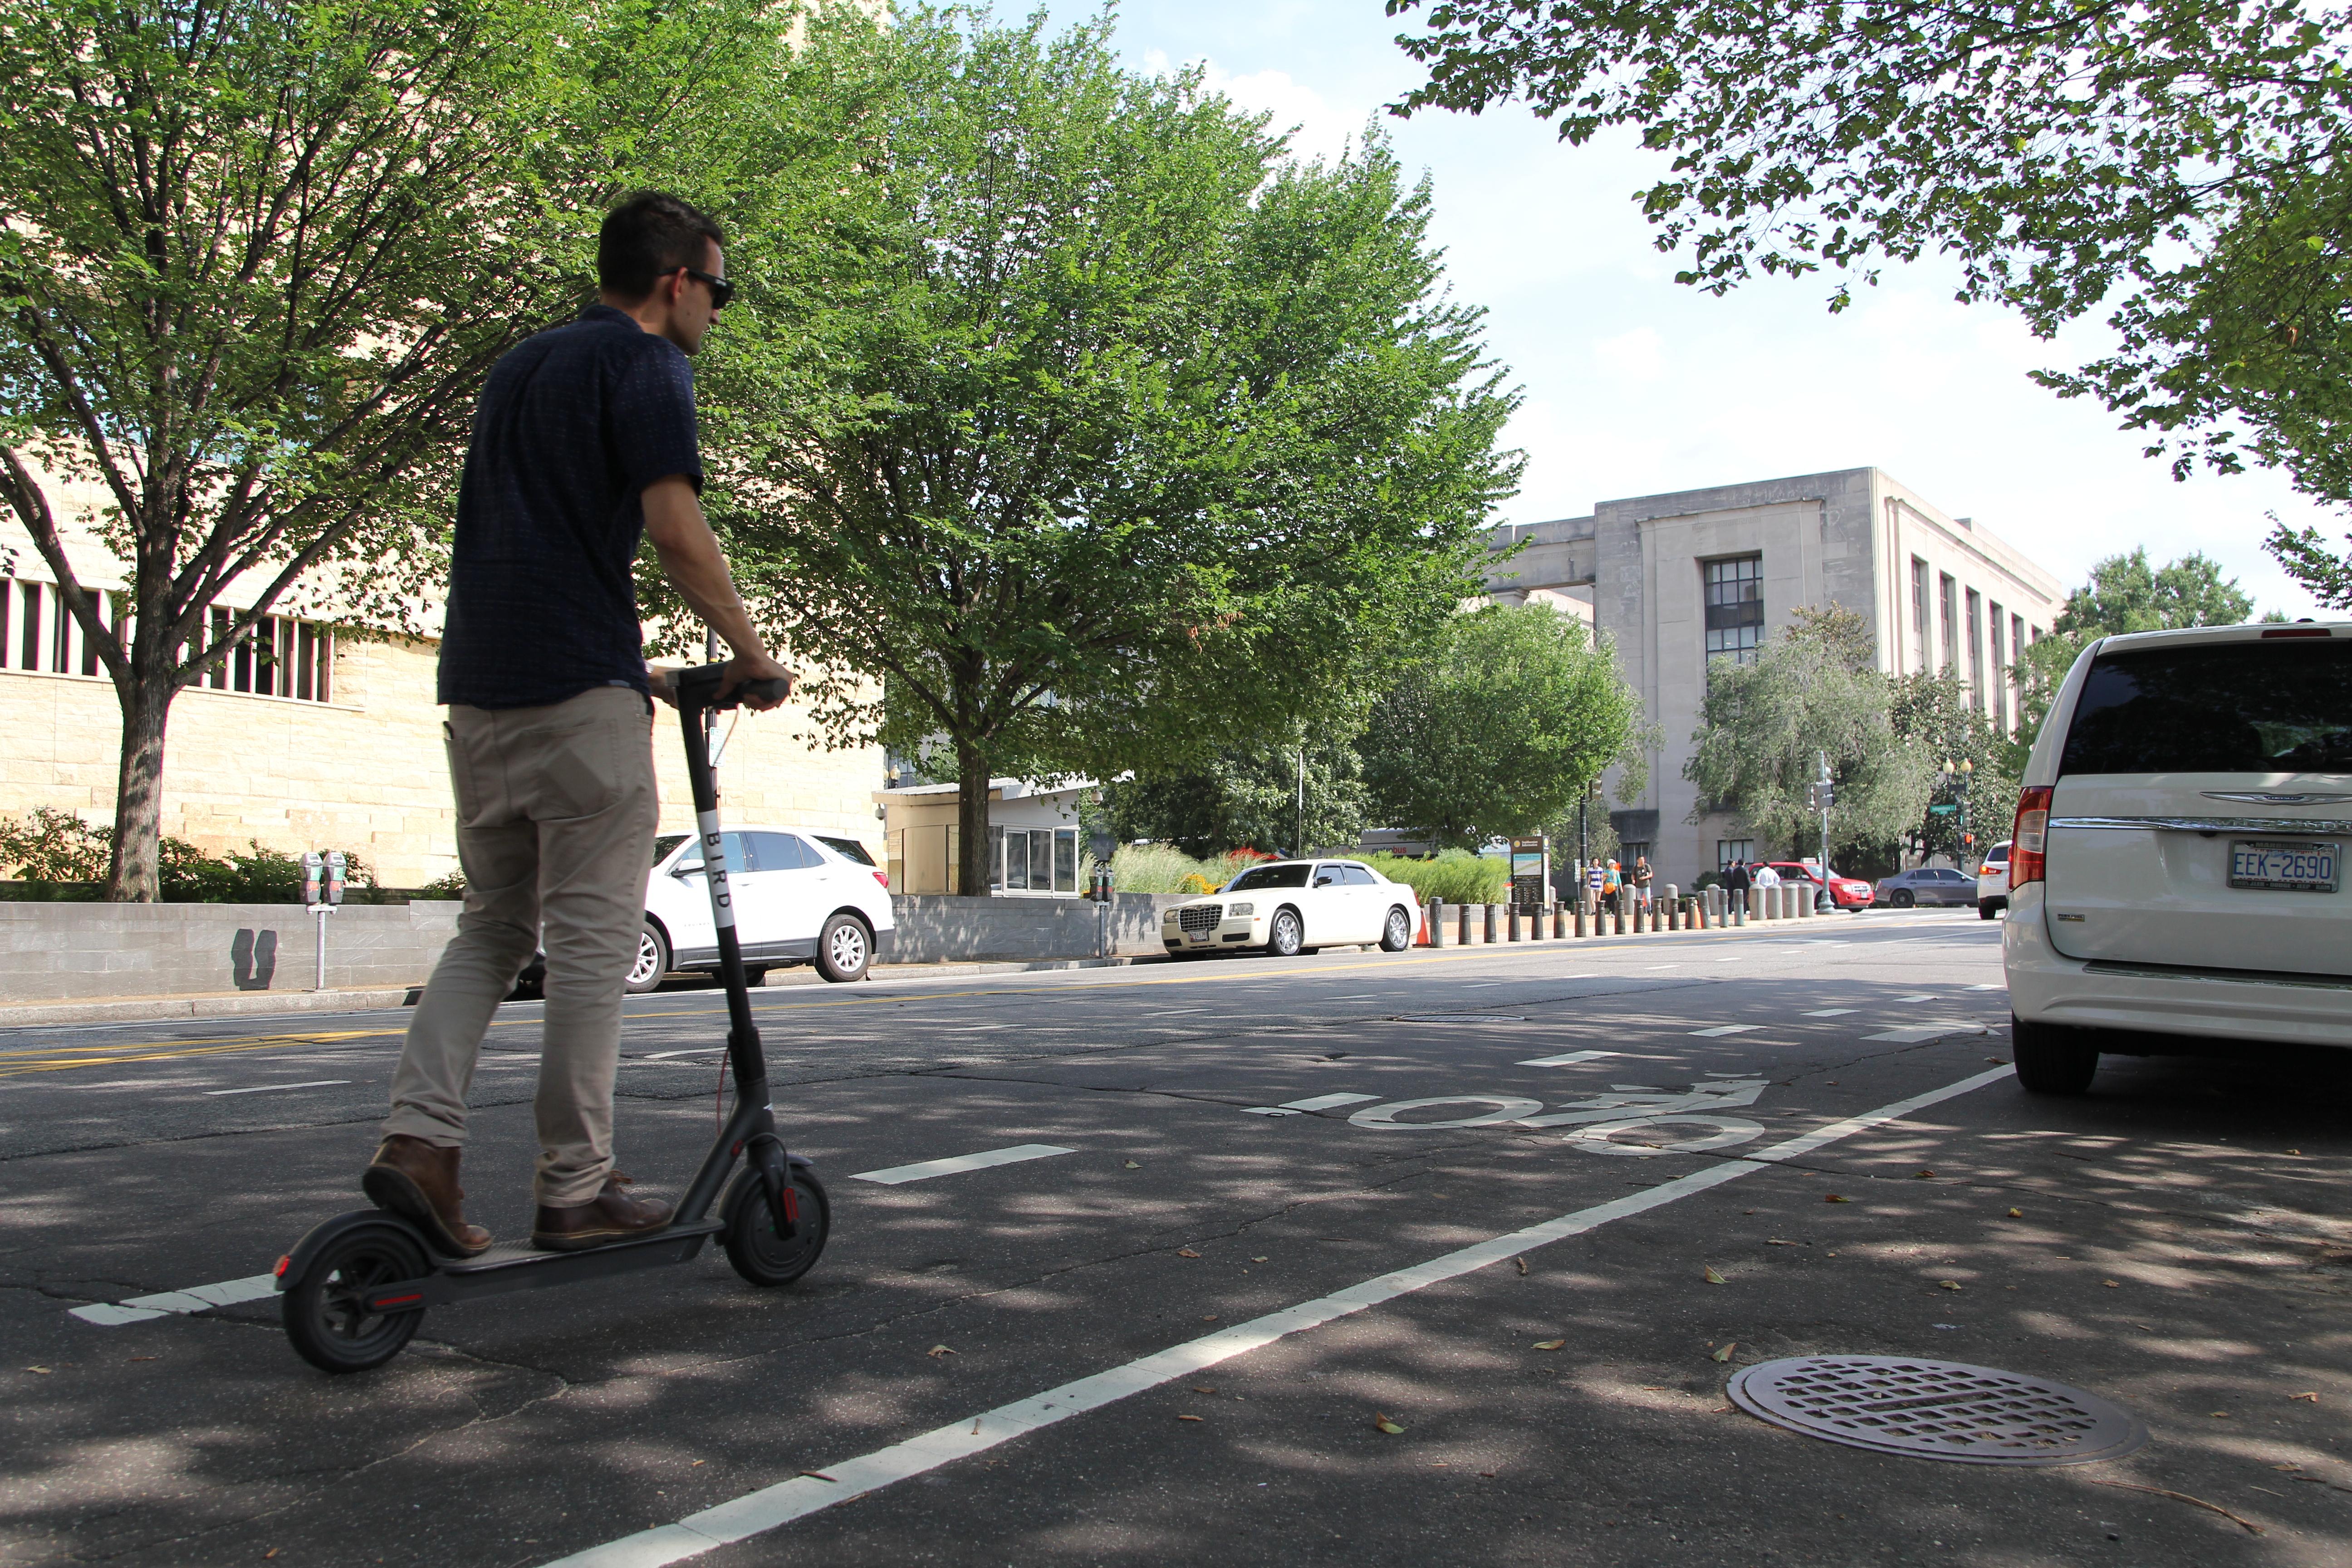 Dockless electric scooters: fad, friend, or foe? - RevZilla